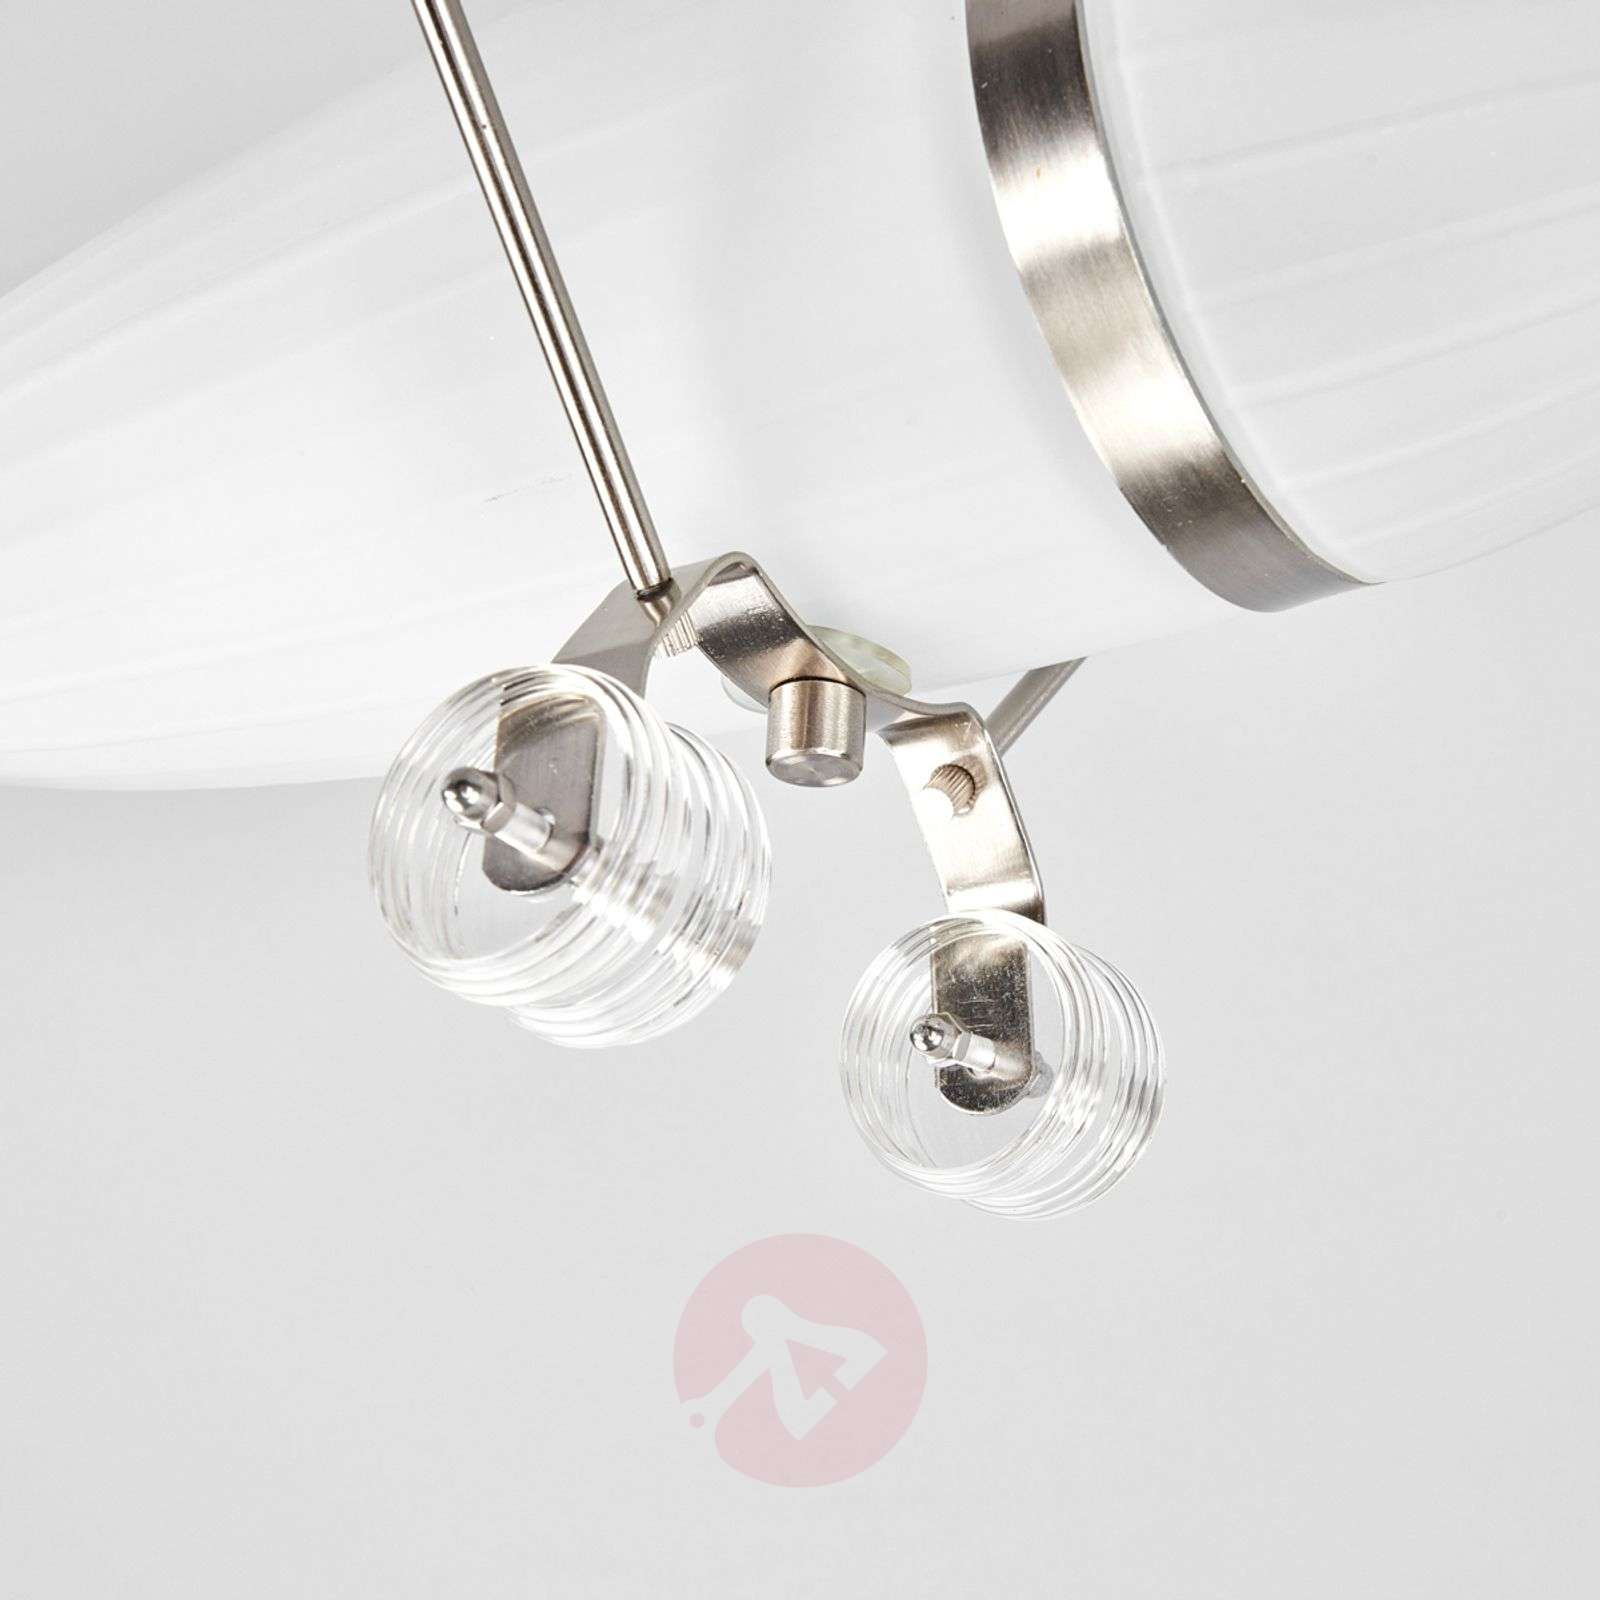 Decorative ceiling light Flya, aeroplane form-8570182-03